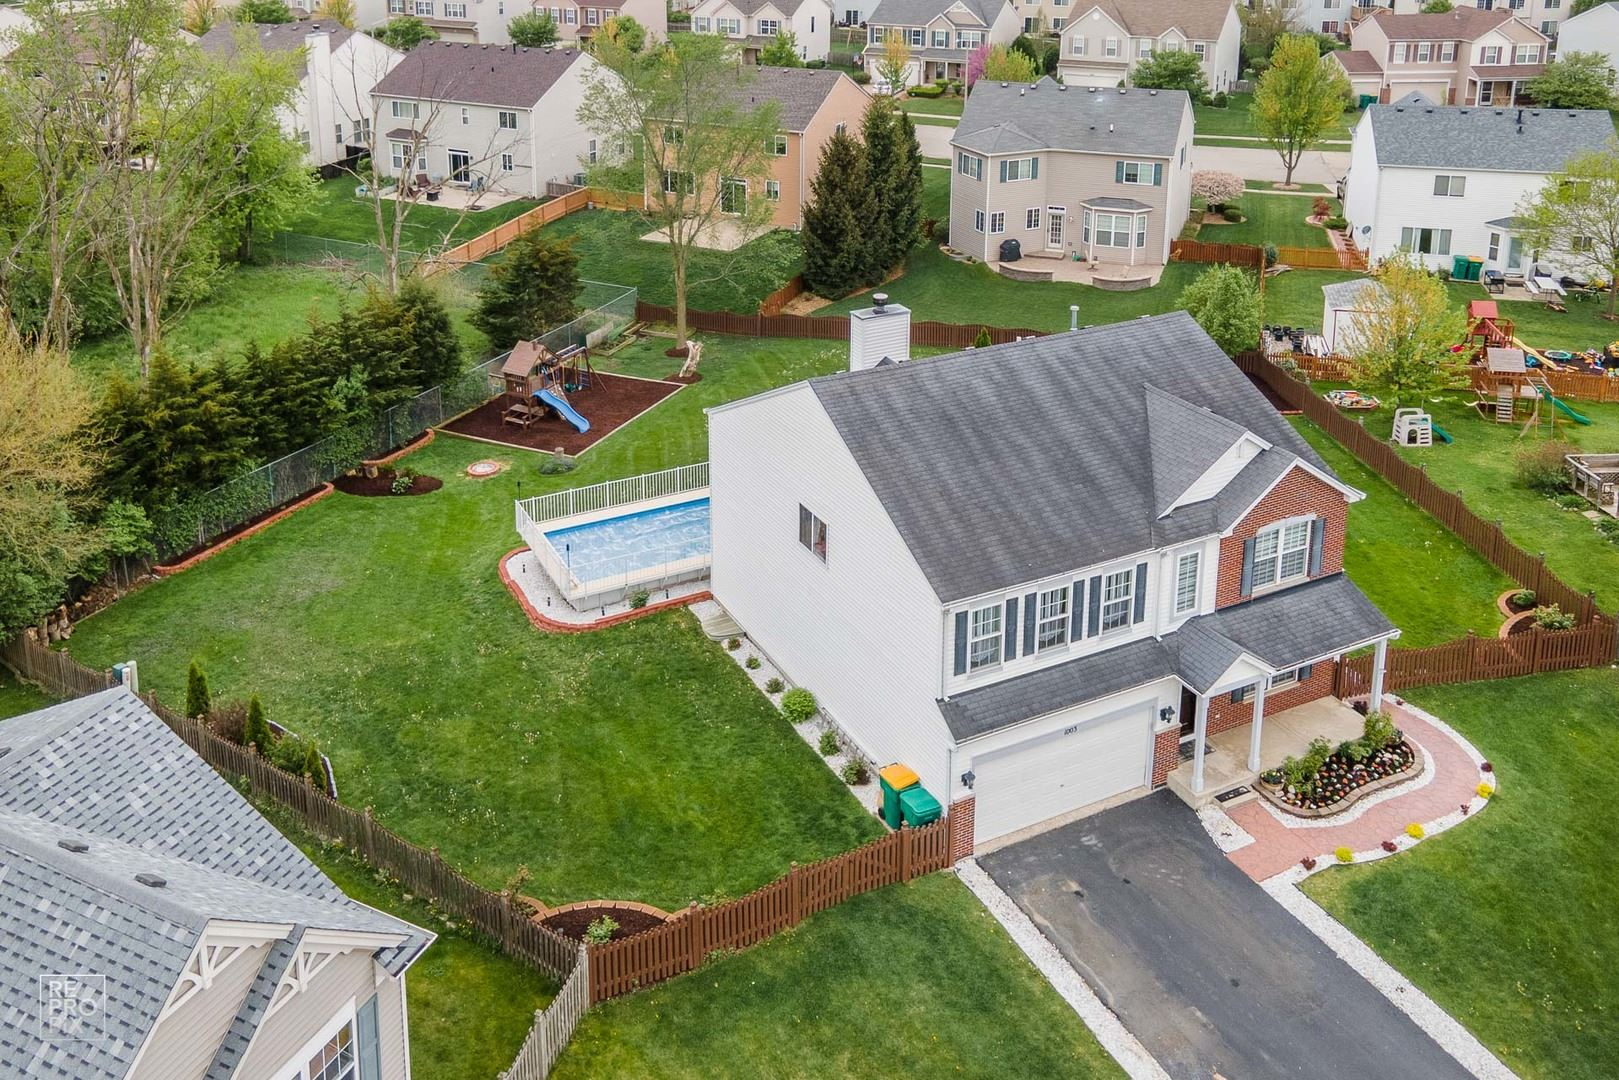 Photo of 1003 Misty Brook Lane, Joliet, IL 60432 (MLS # 11079512)